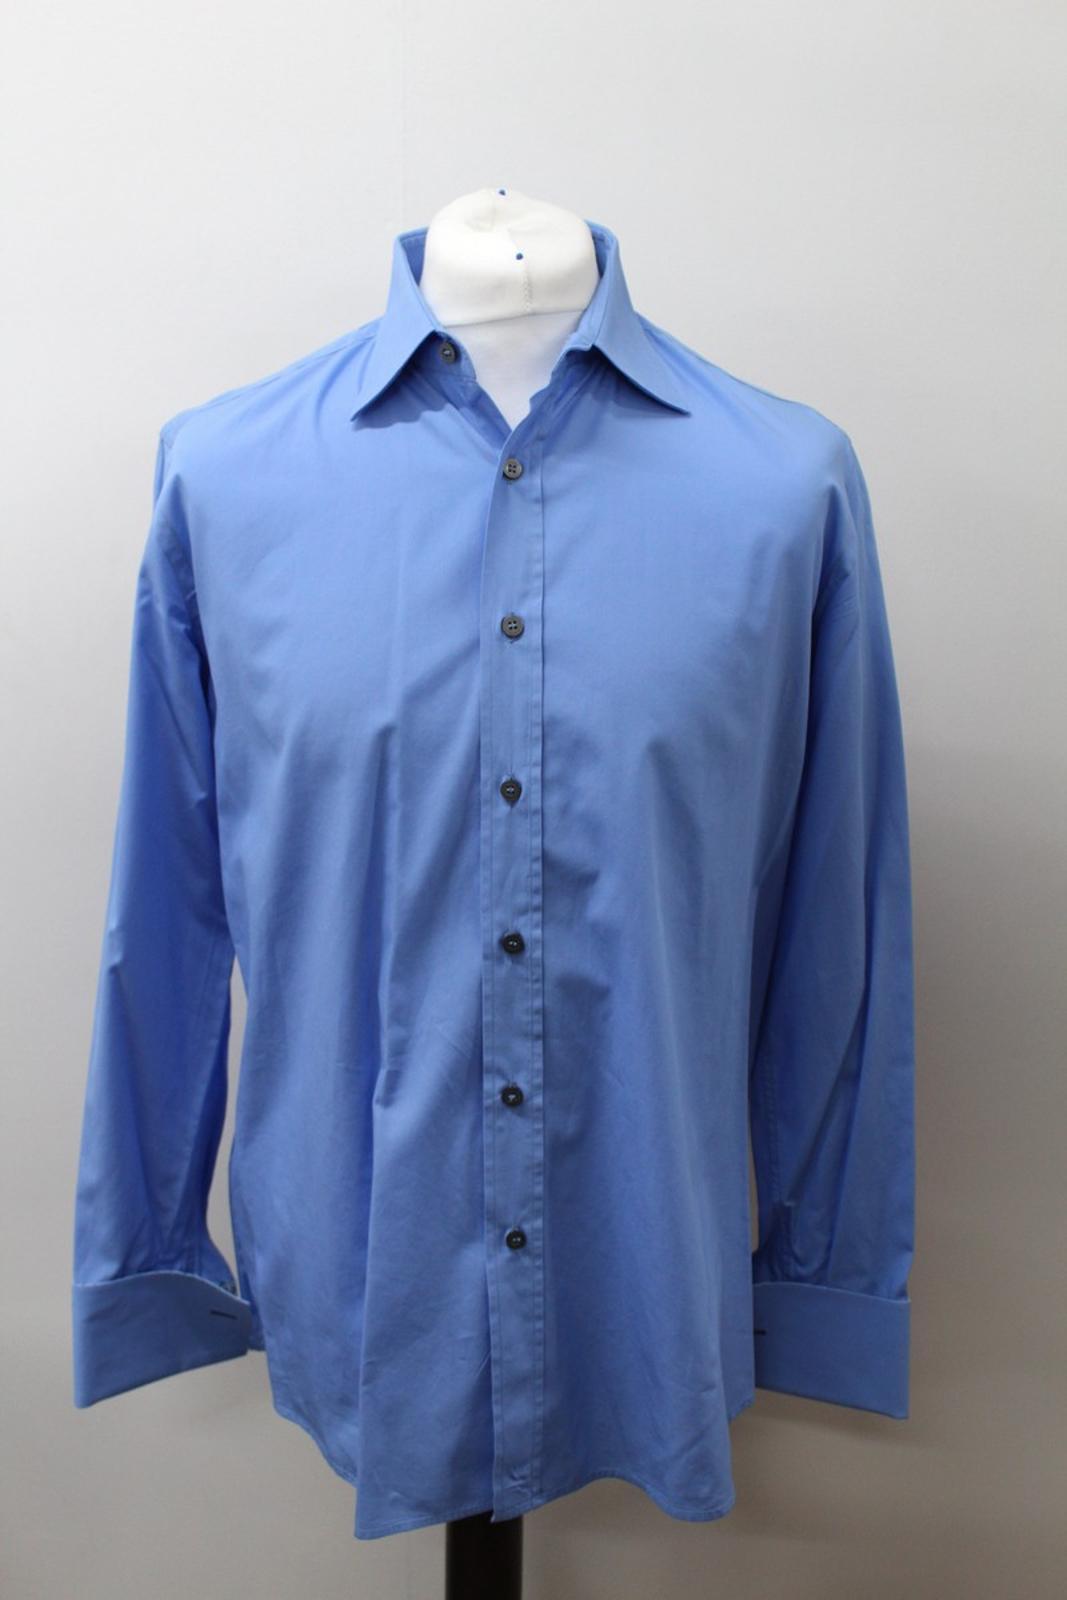 Paul-Smith-Hombres-Azul-Algodon-Mangas-Largas-Camisa-De-Puno-Doble-Cuello-16-5-034-42cm miniatura 2